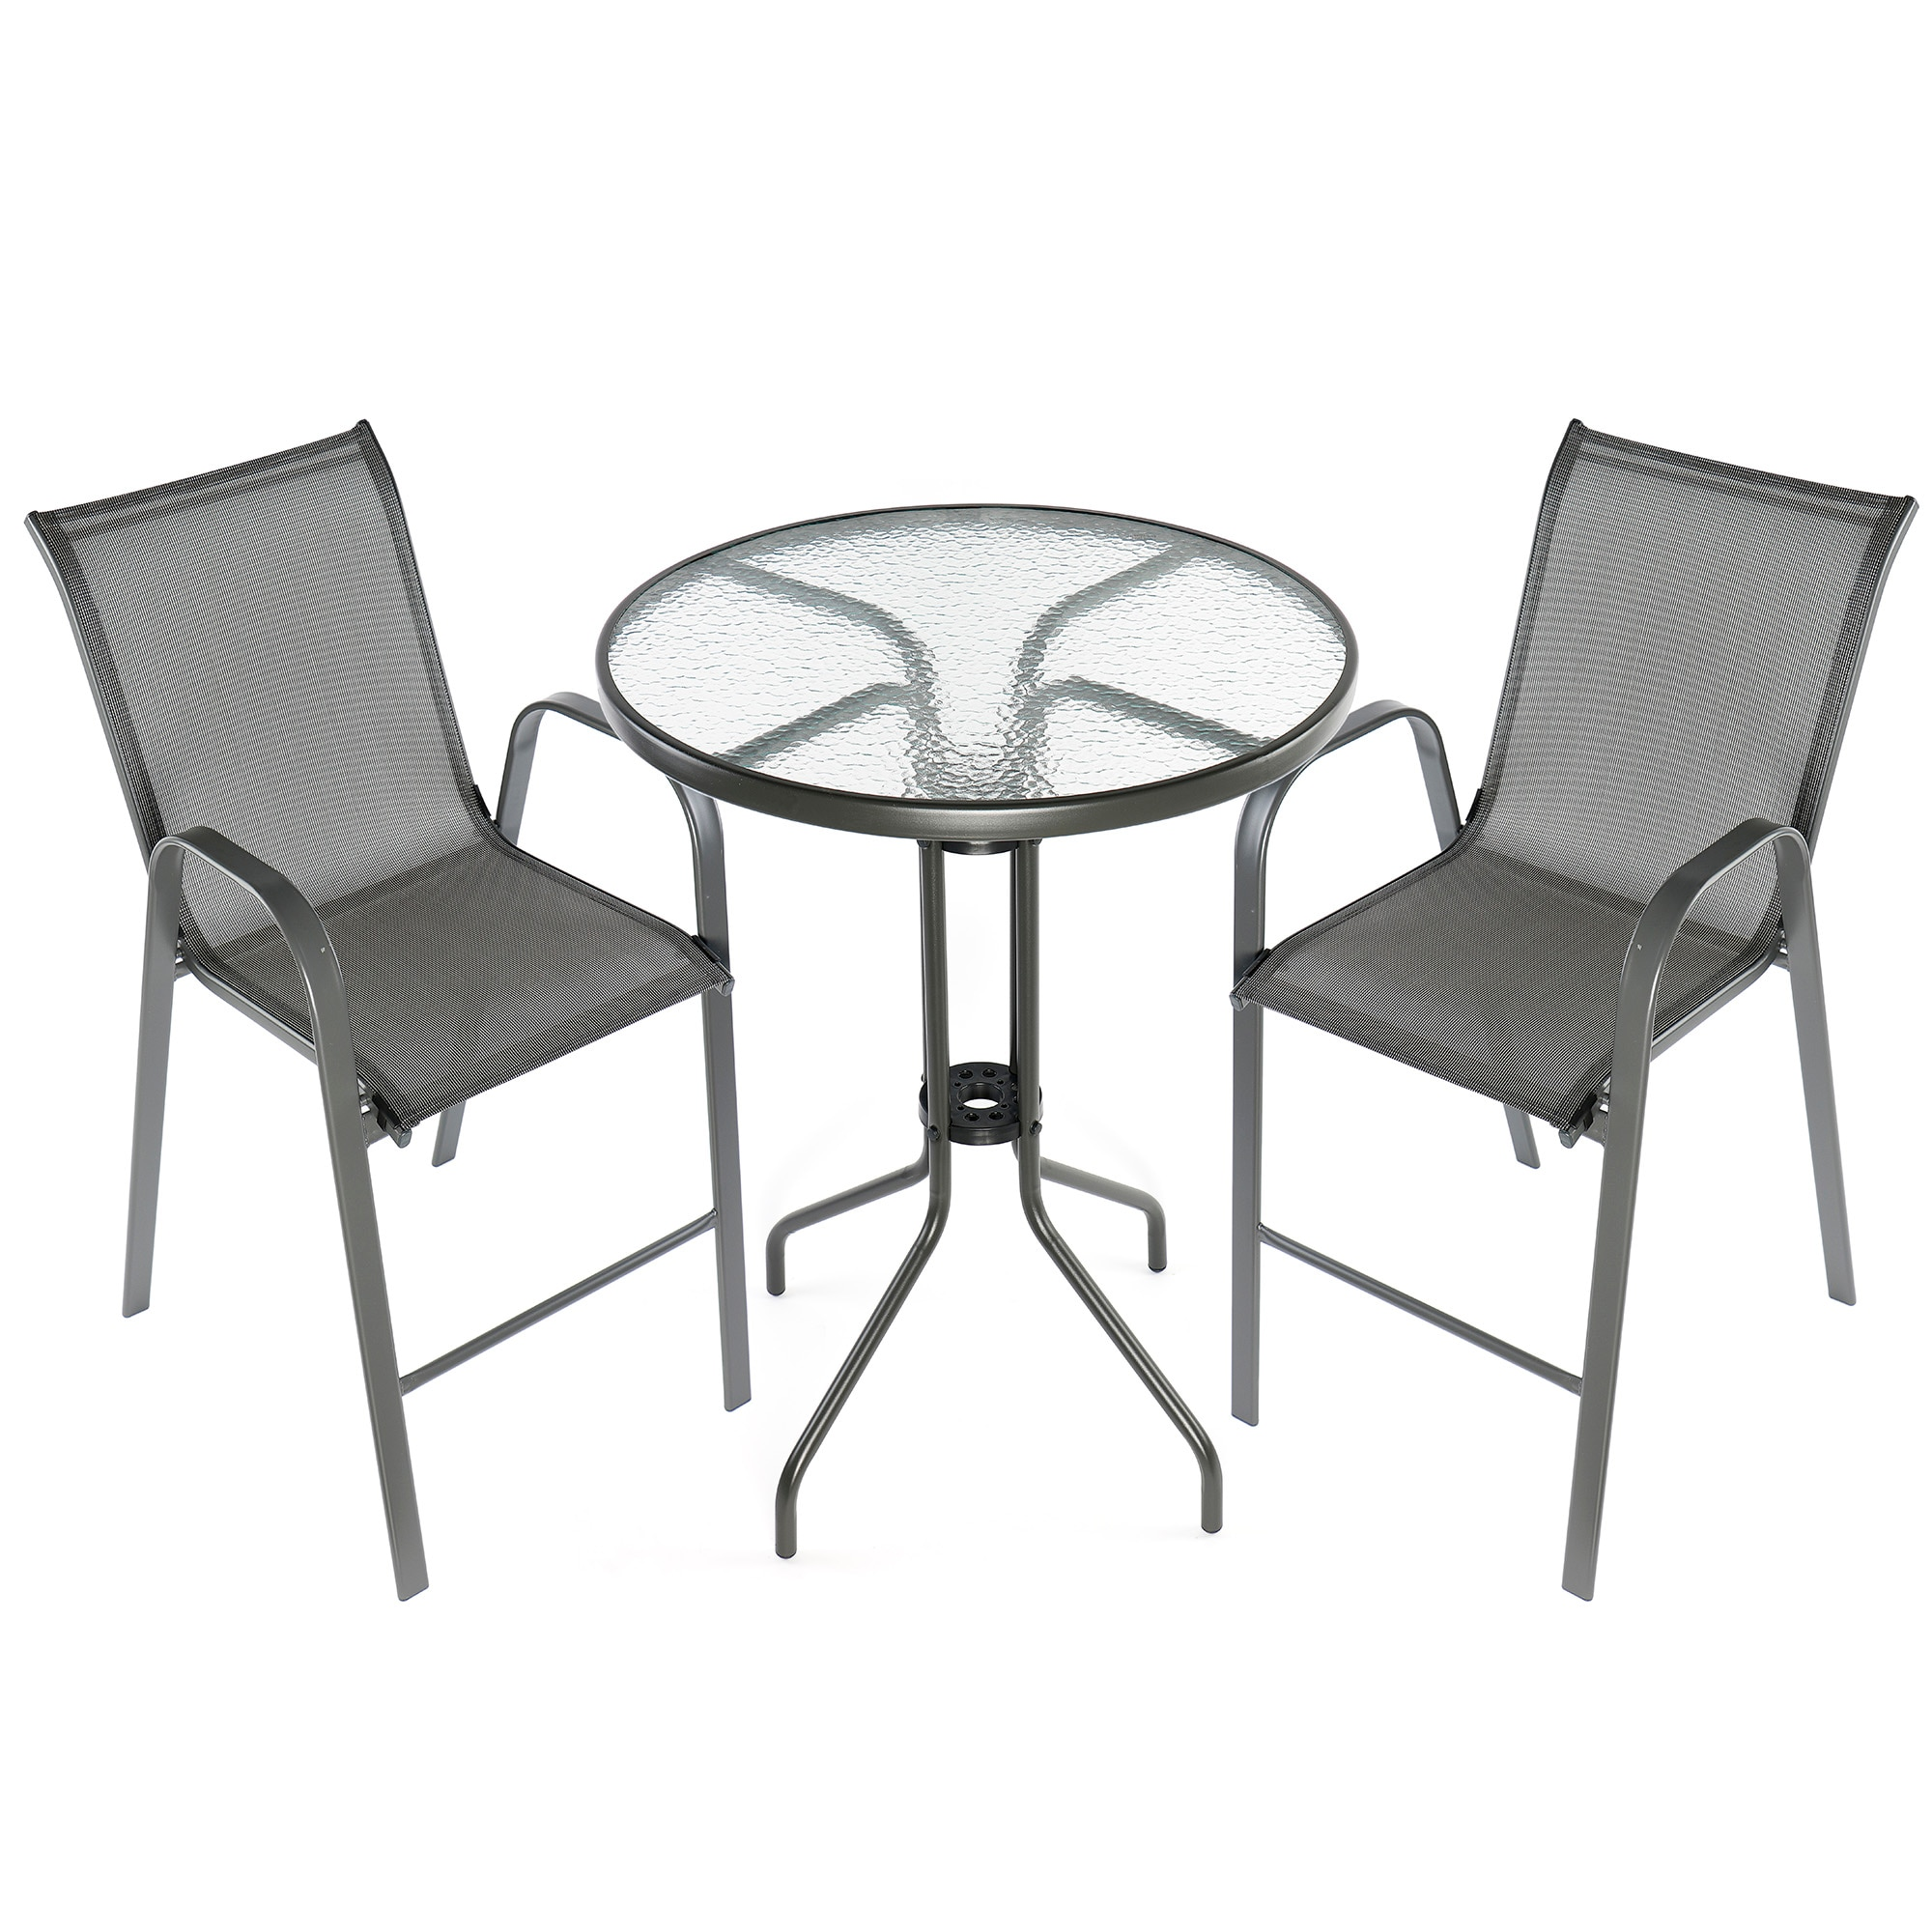 Fotografie Set mobilier gradina/terasa/balcon Kring Bruxelles Bar, masa, 2 scaune, metal/sticla, gri